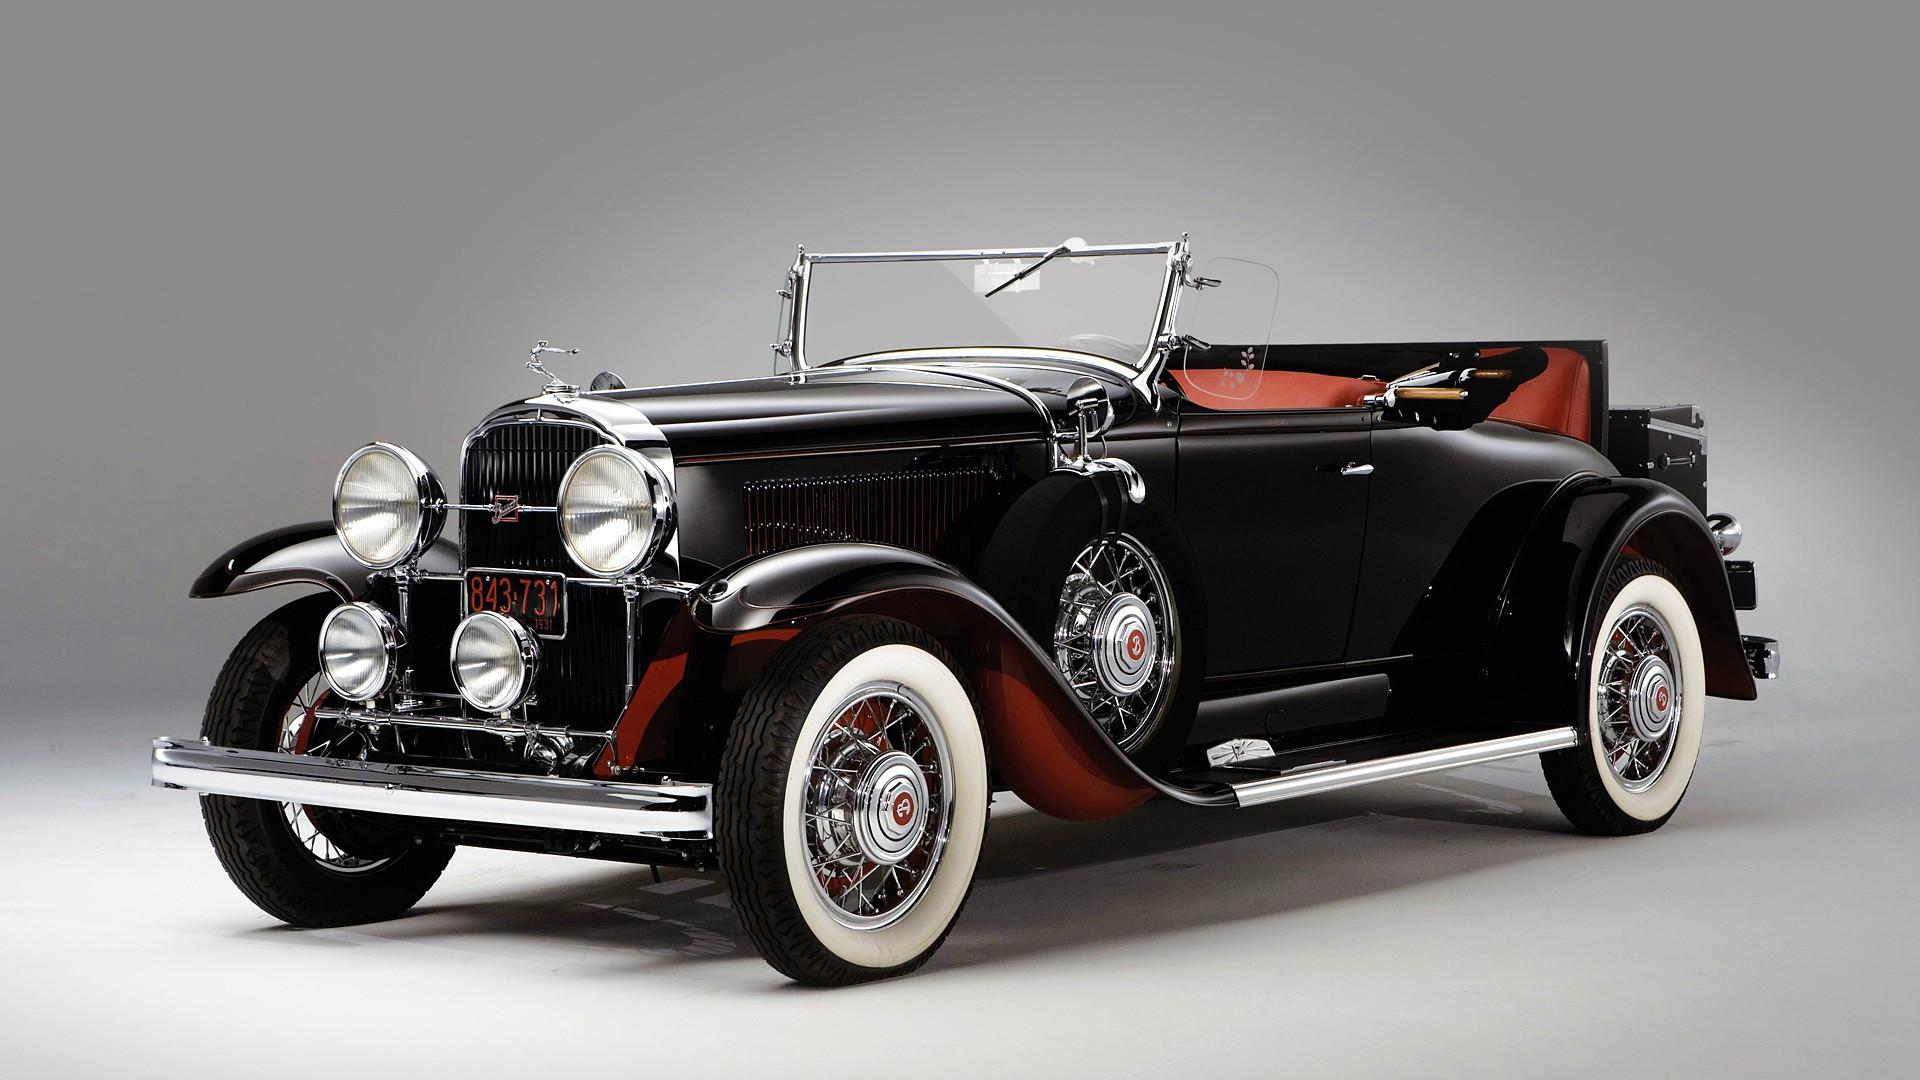 1931 Buick wallpaper   876412 1920x1080